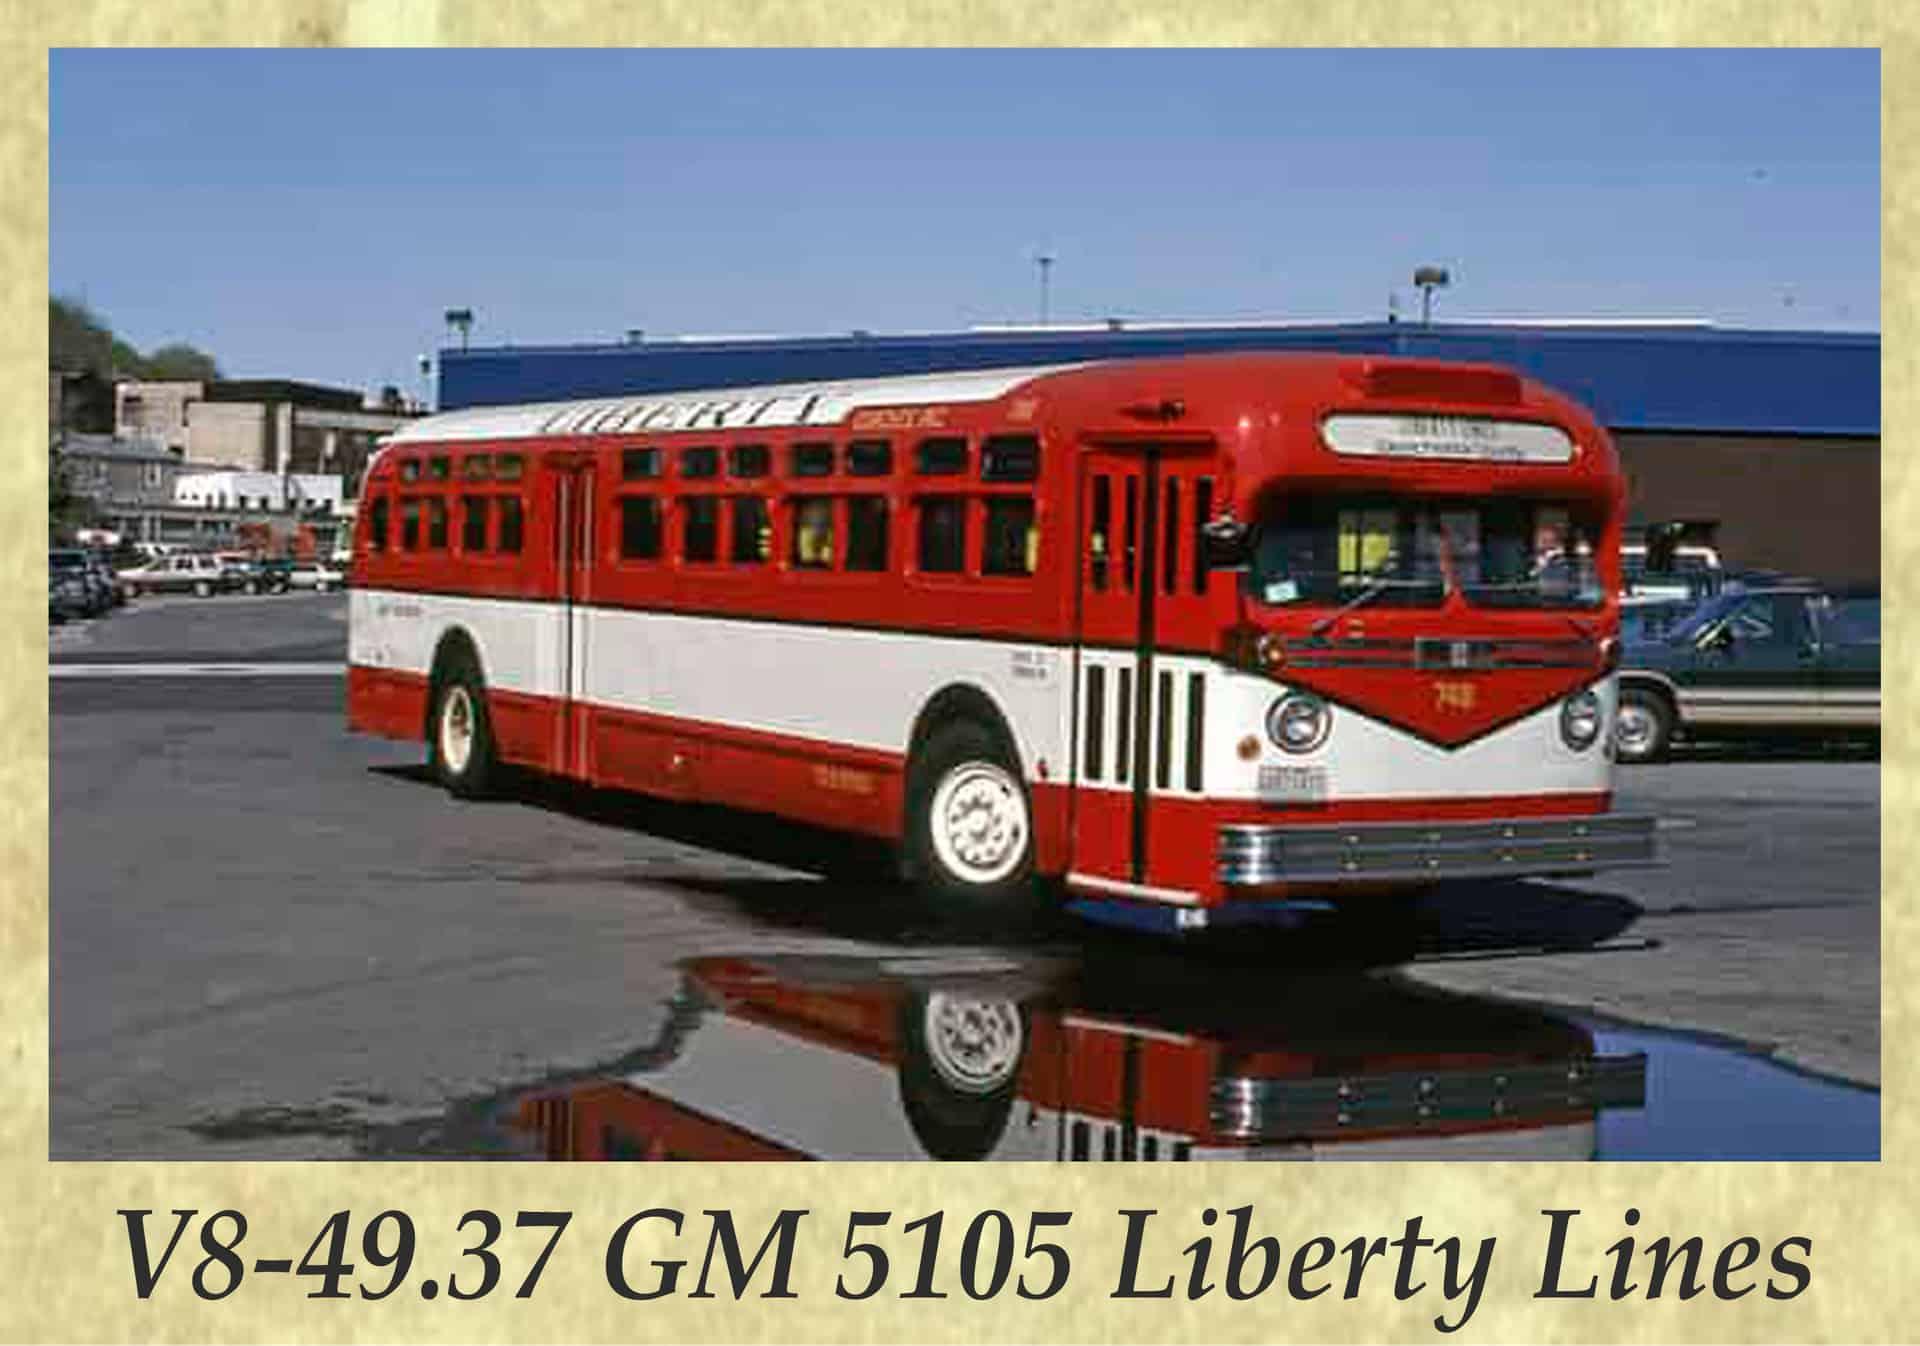 V8-49.37 GM 5105 Liberty Lines